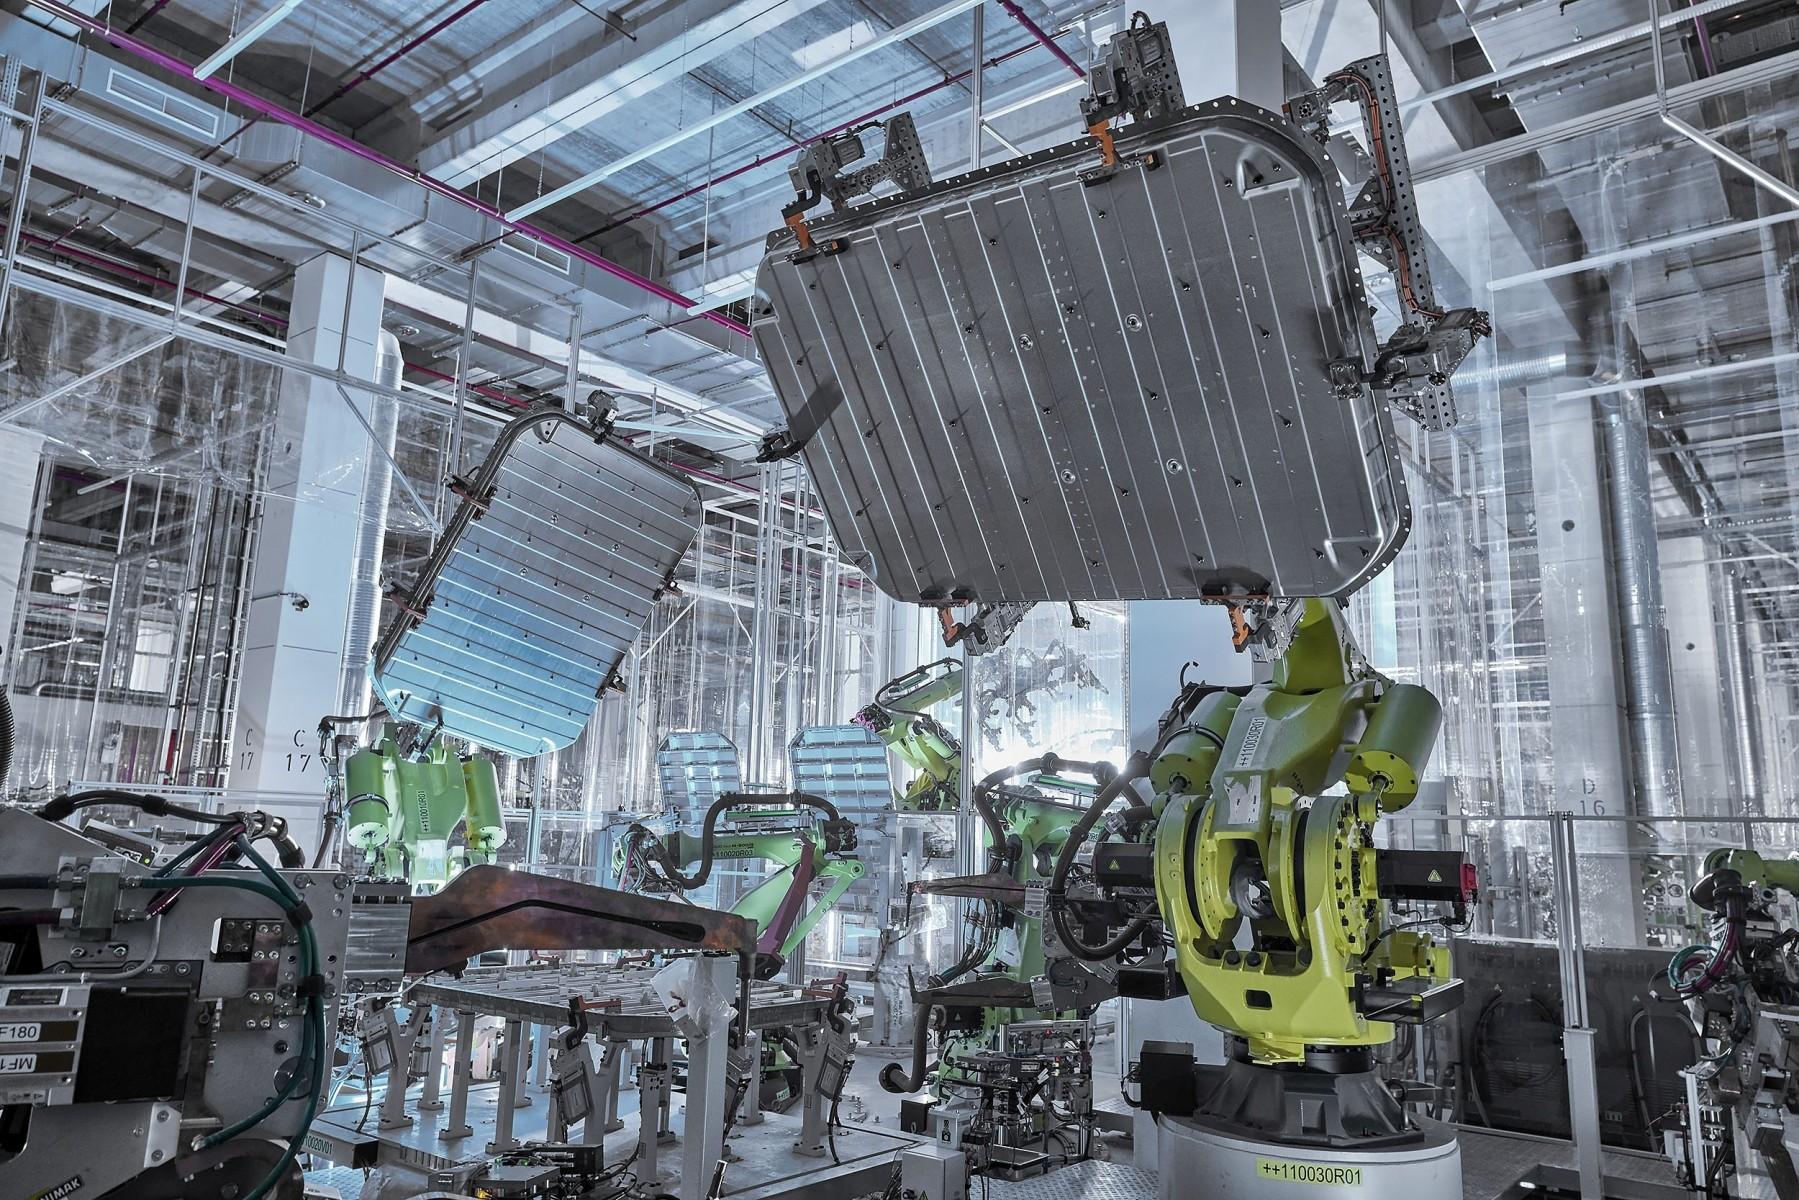 Duurzaam aluminium voor batterijbehuizing Audi e-tron